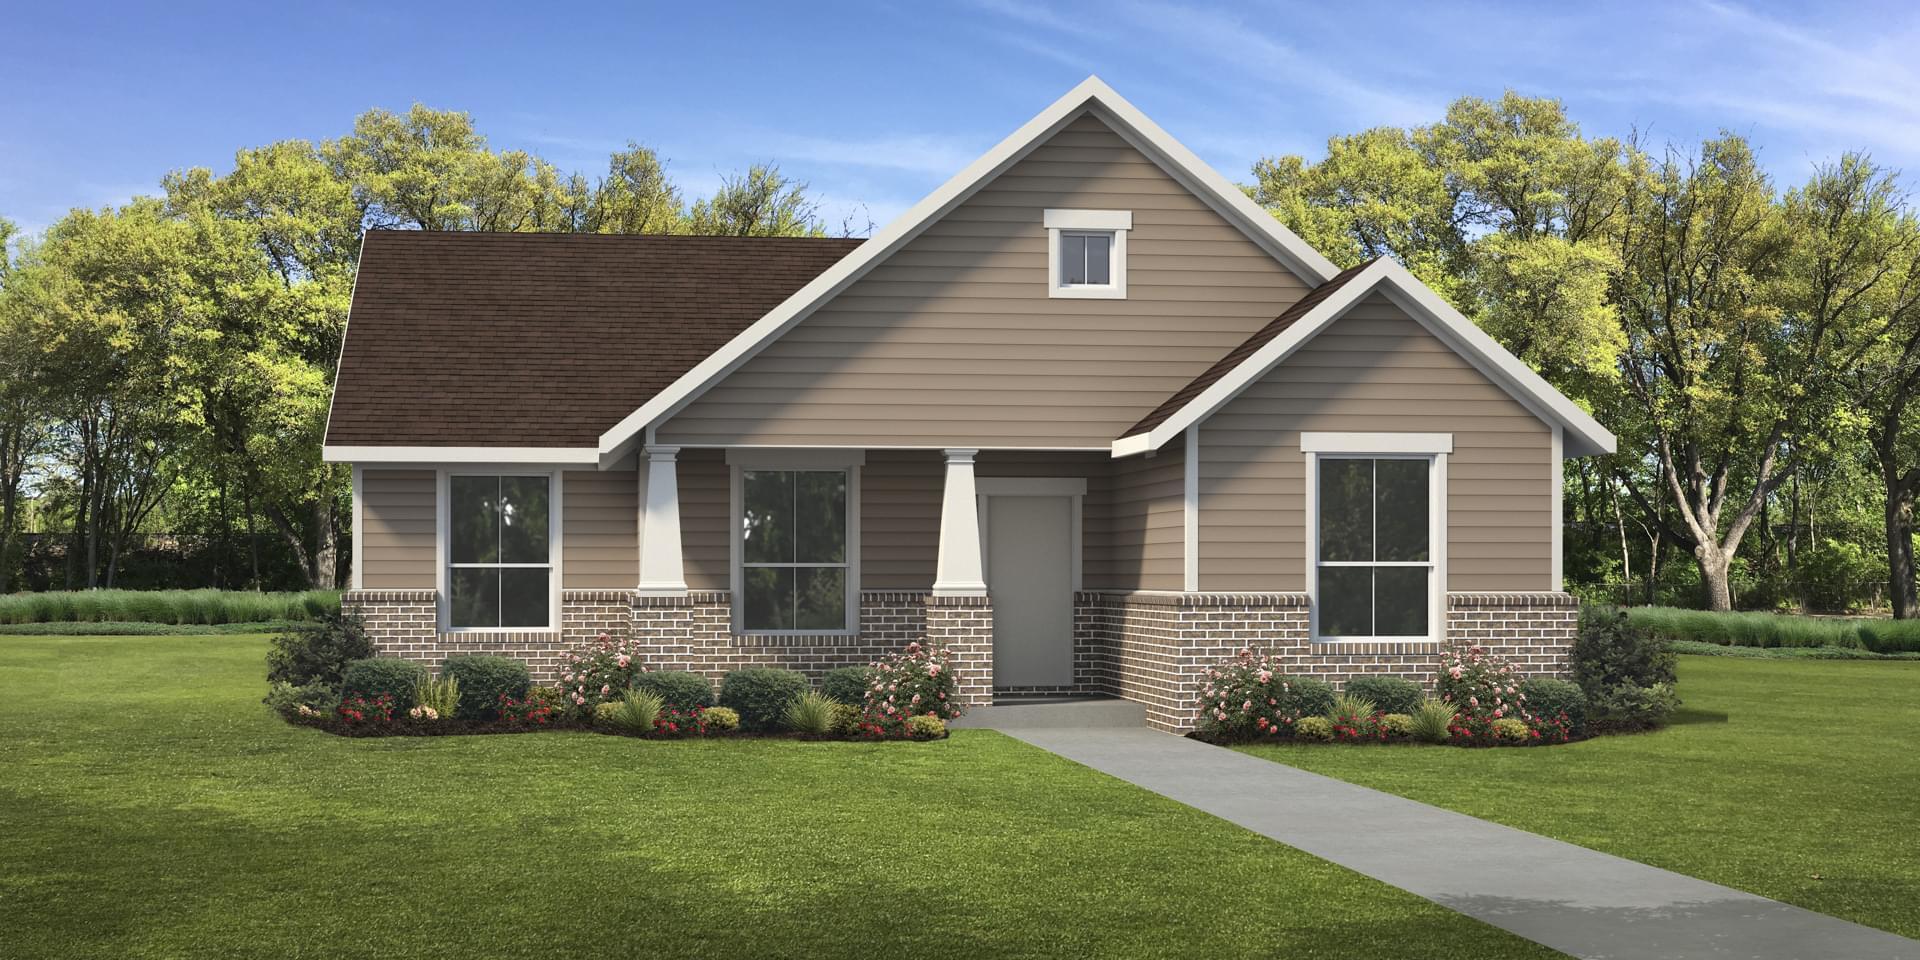 The Floresville Custom Home Plan from Tilson Homes